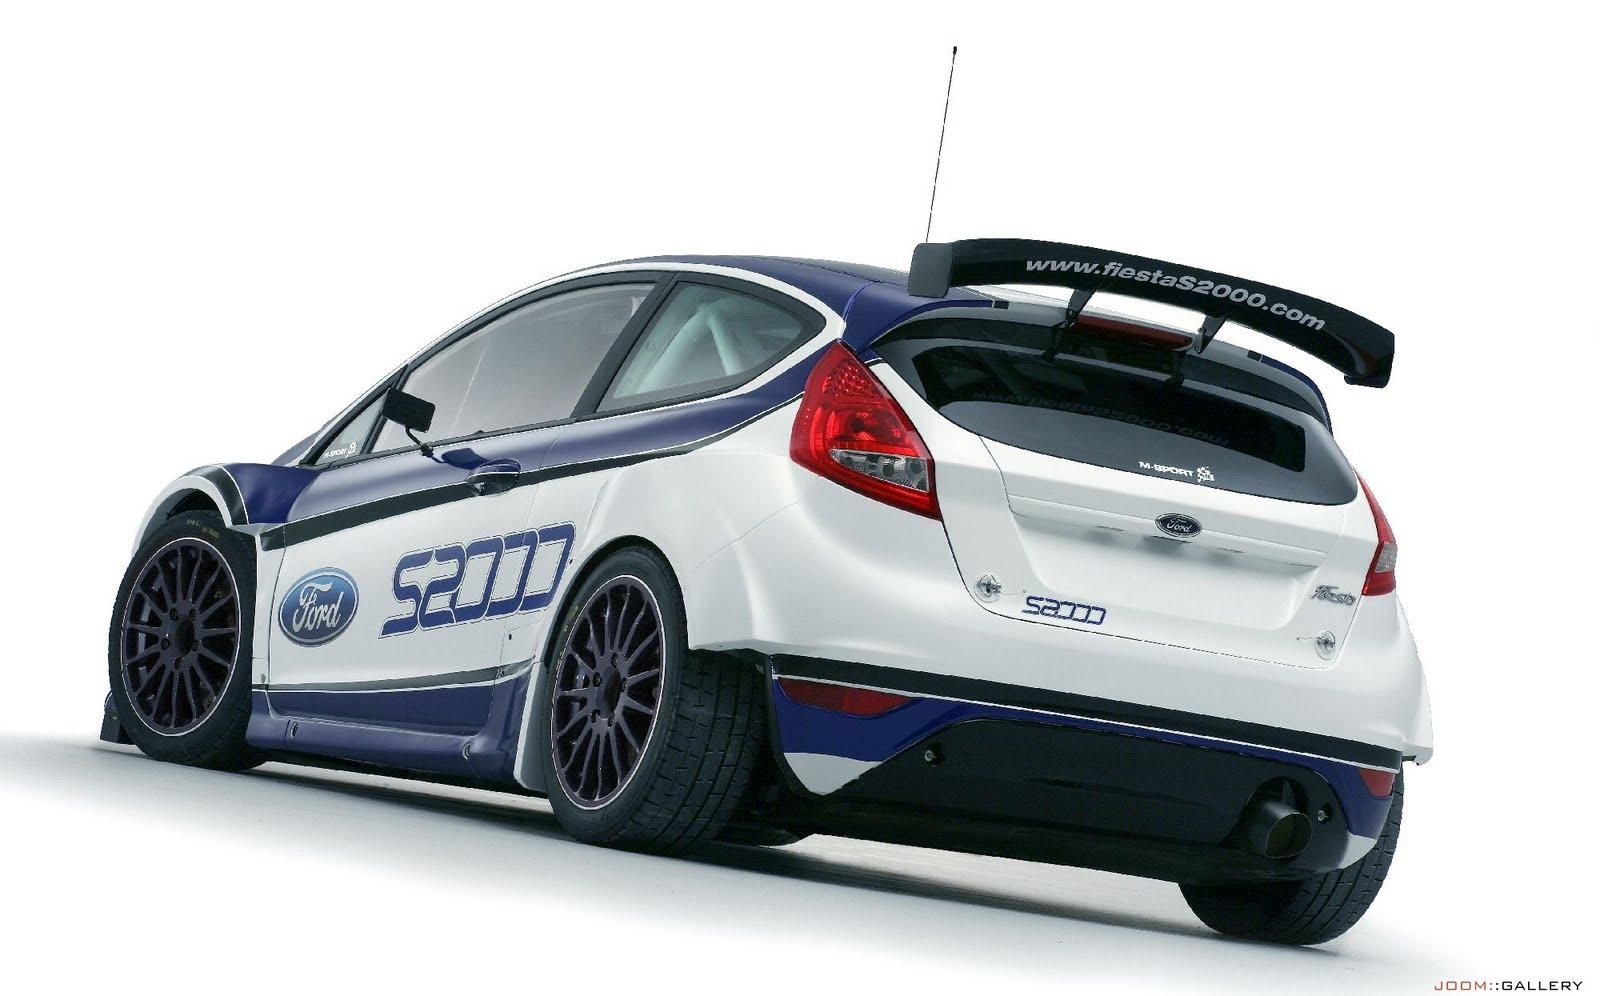 presented Fiesta S2000